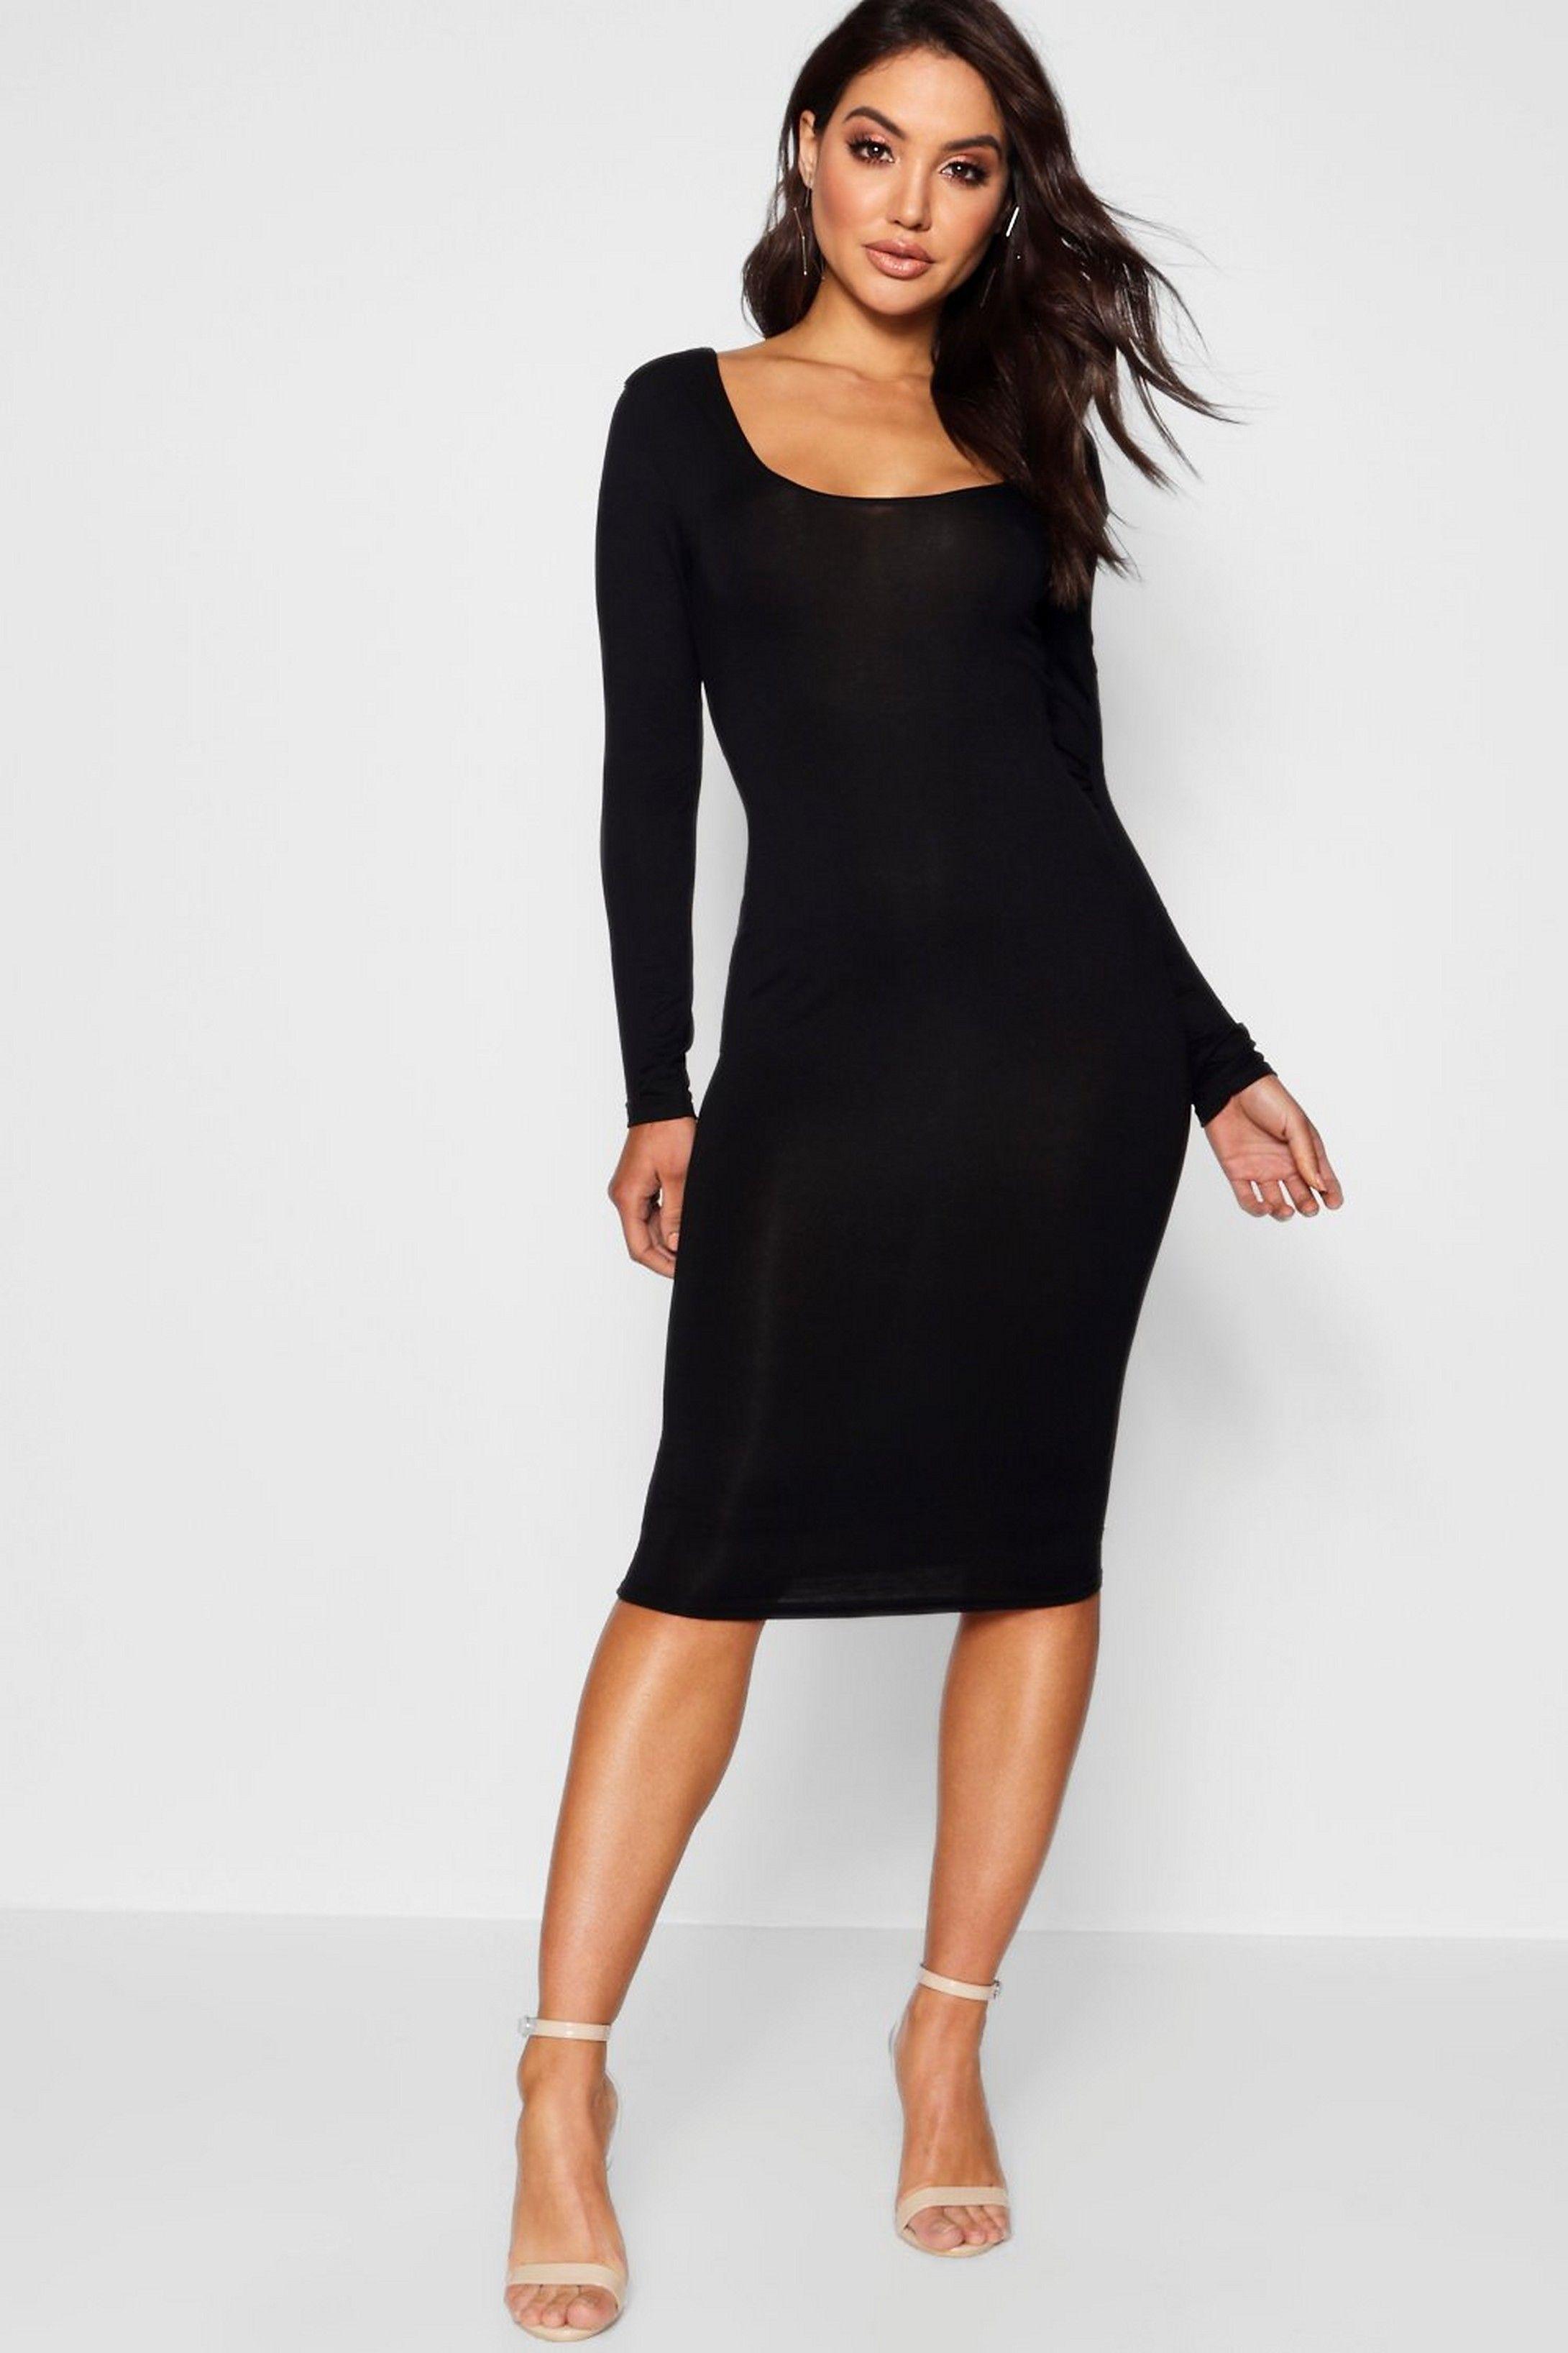 466f95962dedc Square Neck Long Sleeved Bodycon Dress in 2019   Bodycon dress ...